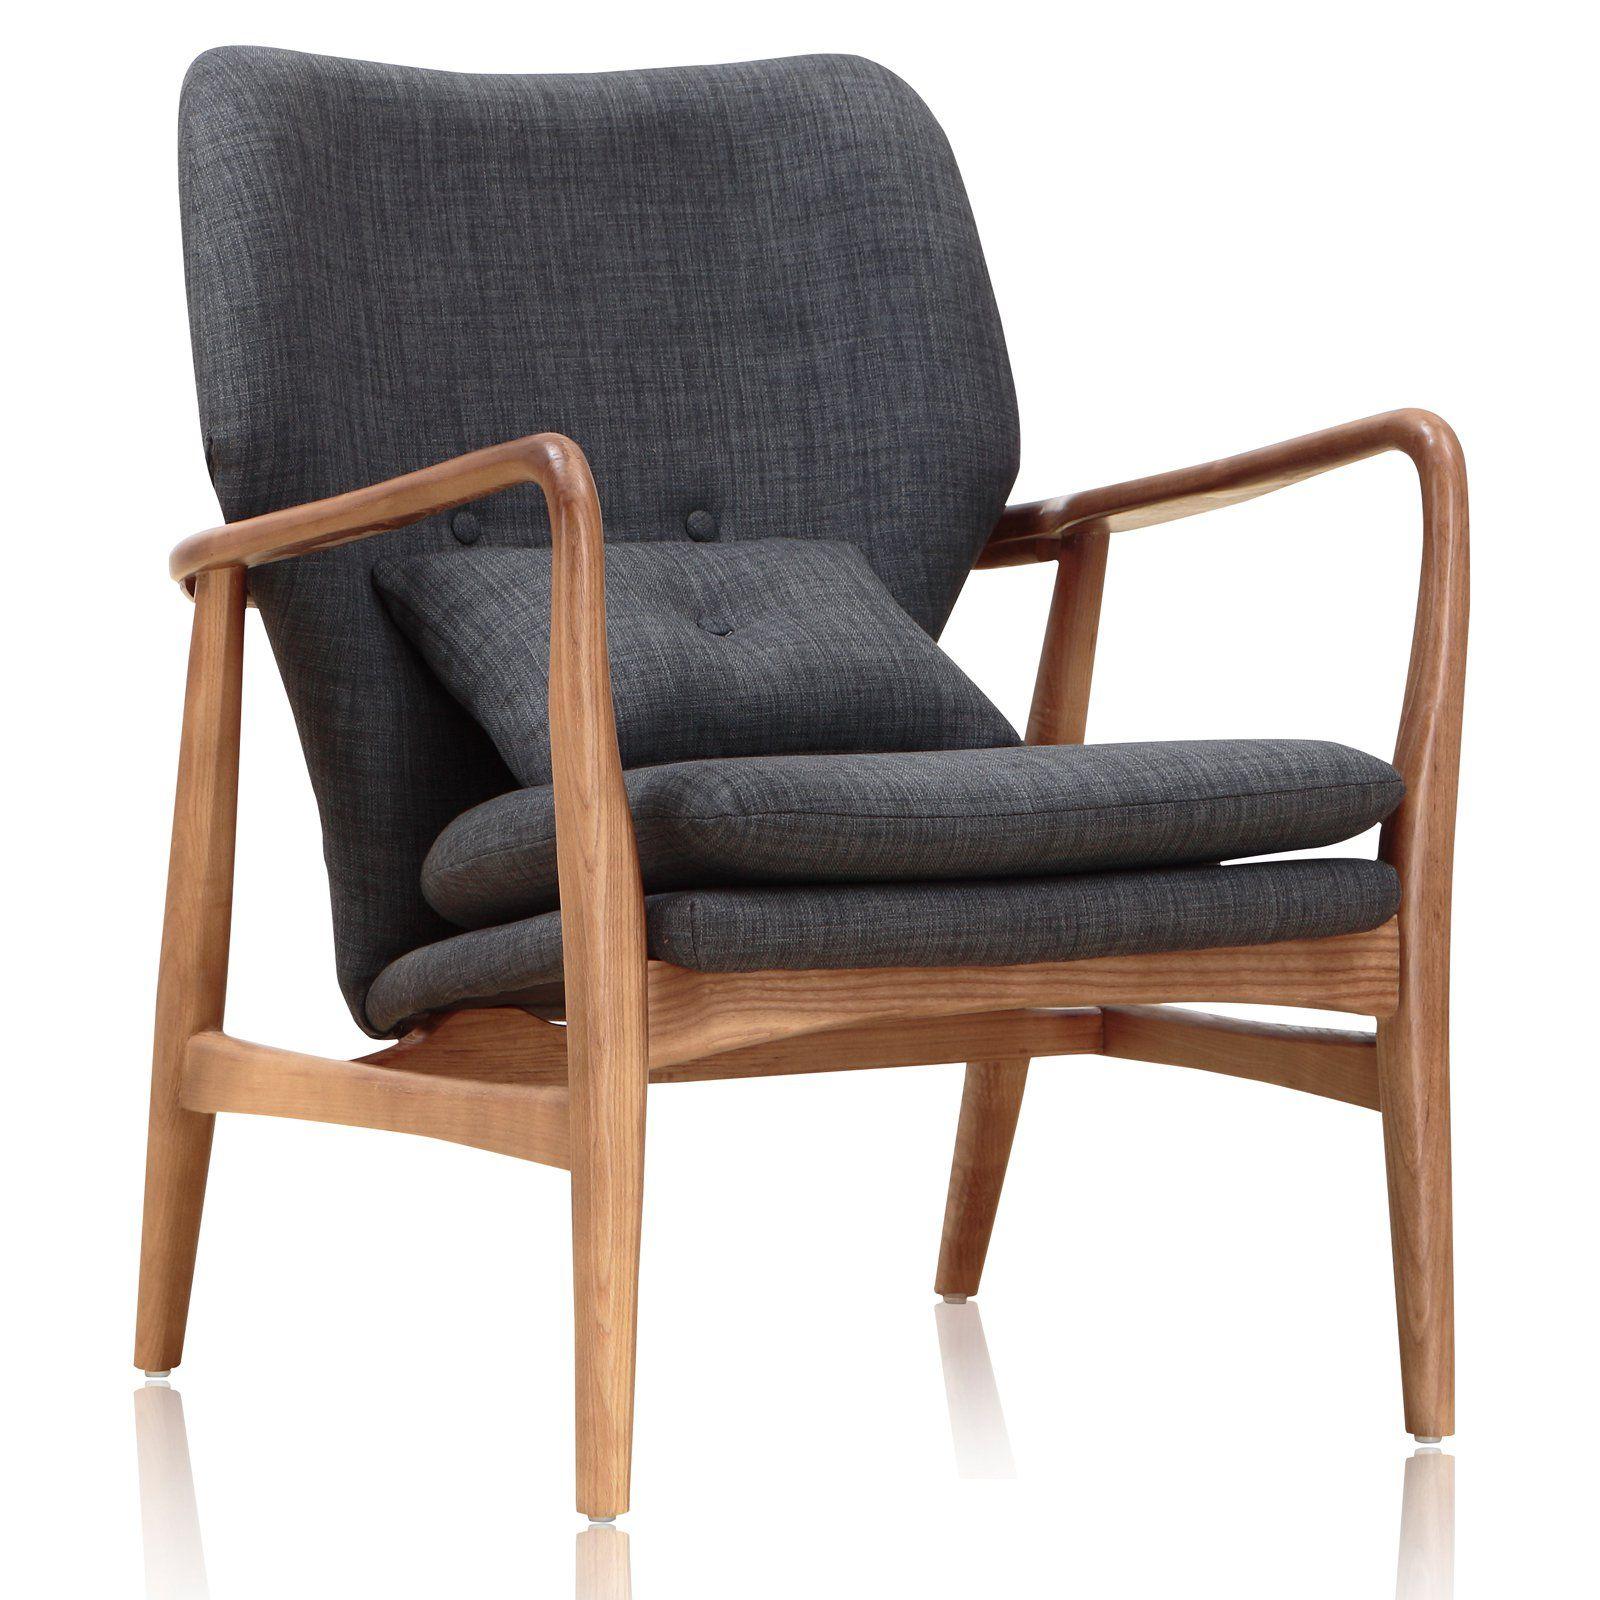 Ceets Bradley Leisure Chair 9b703506 922 Club Chairs